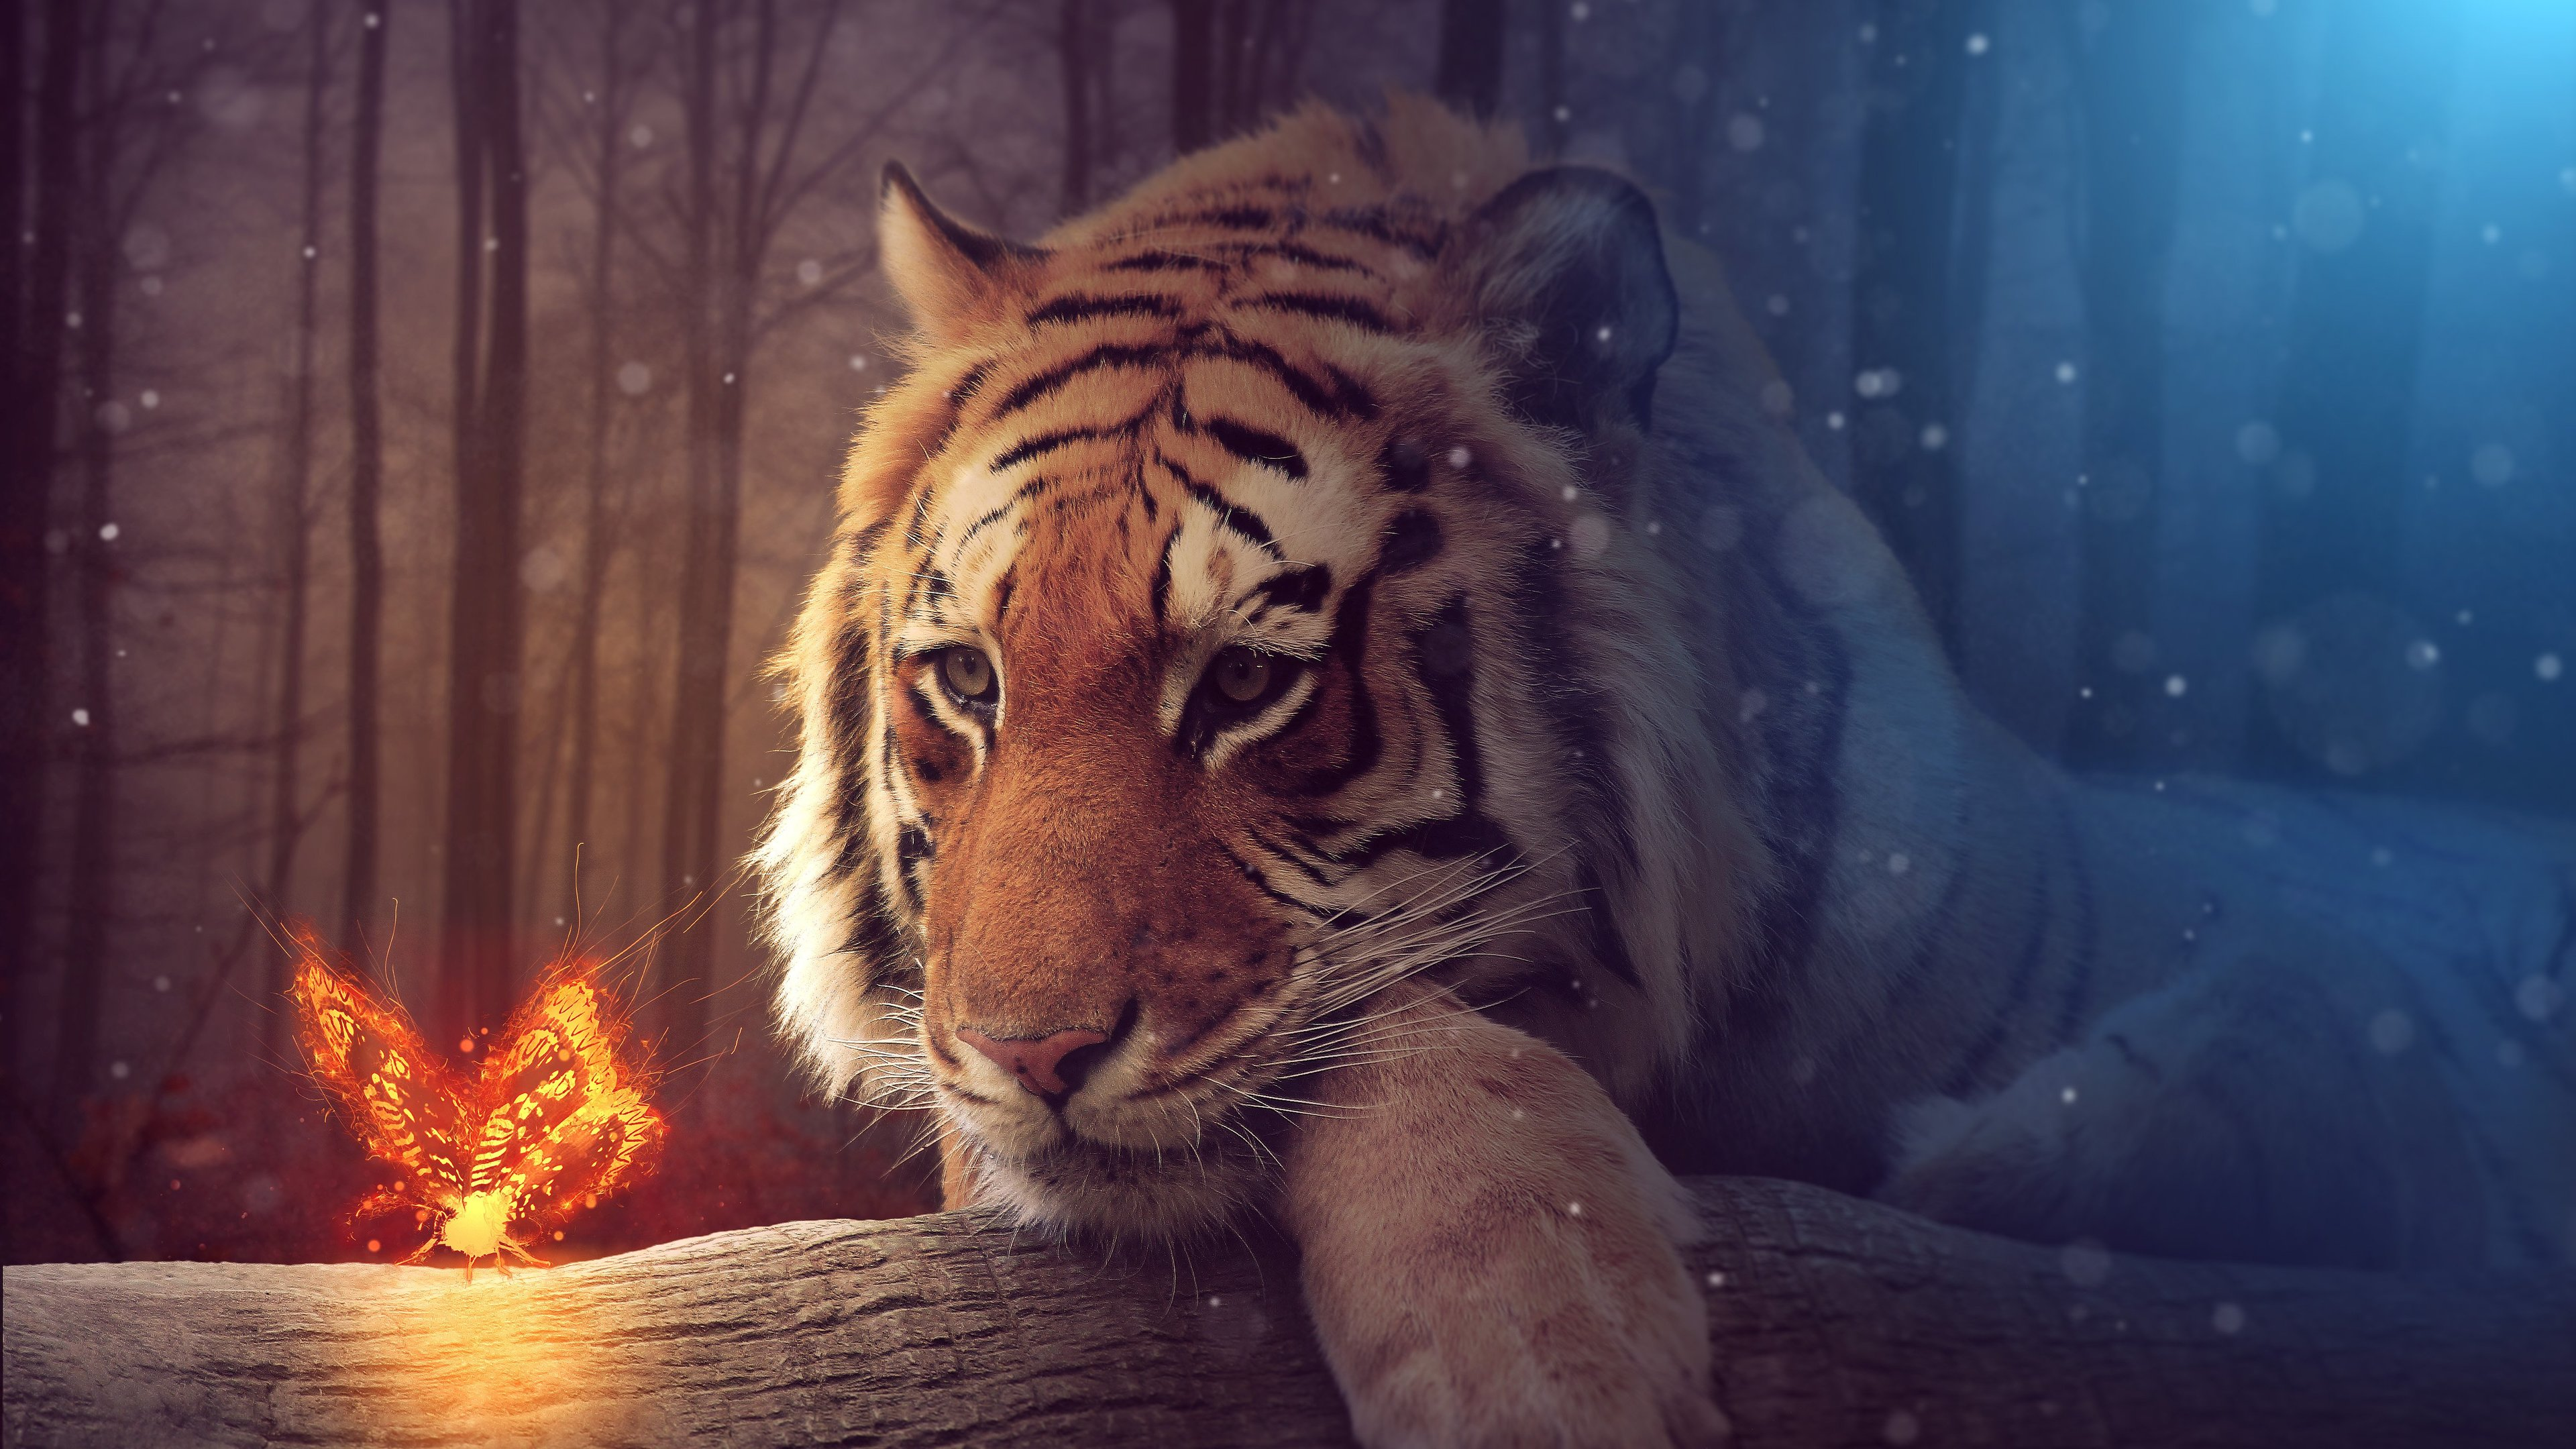 tiger dreamy art 4k 1540748626 - Tiger Dreamy Art 4k - tiger wallpapers, artist wallpapers, art wallpapers